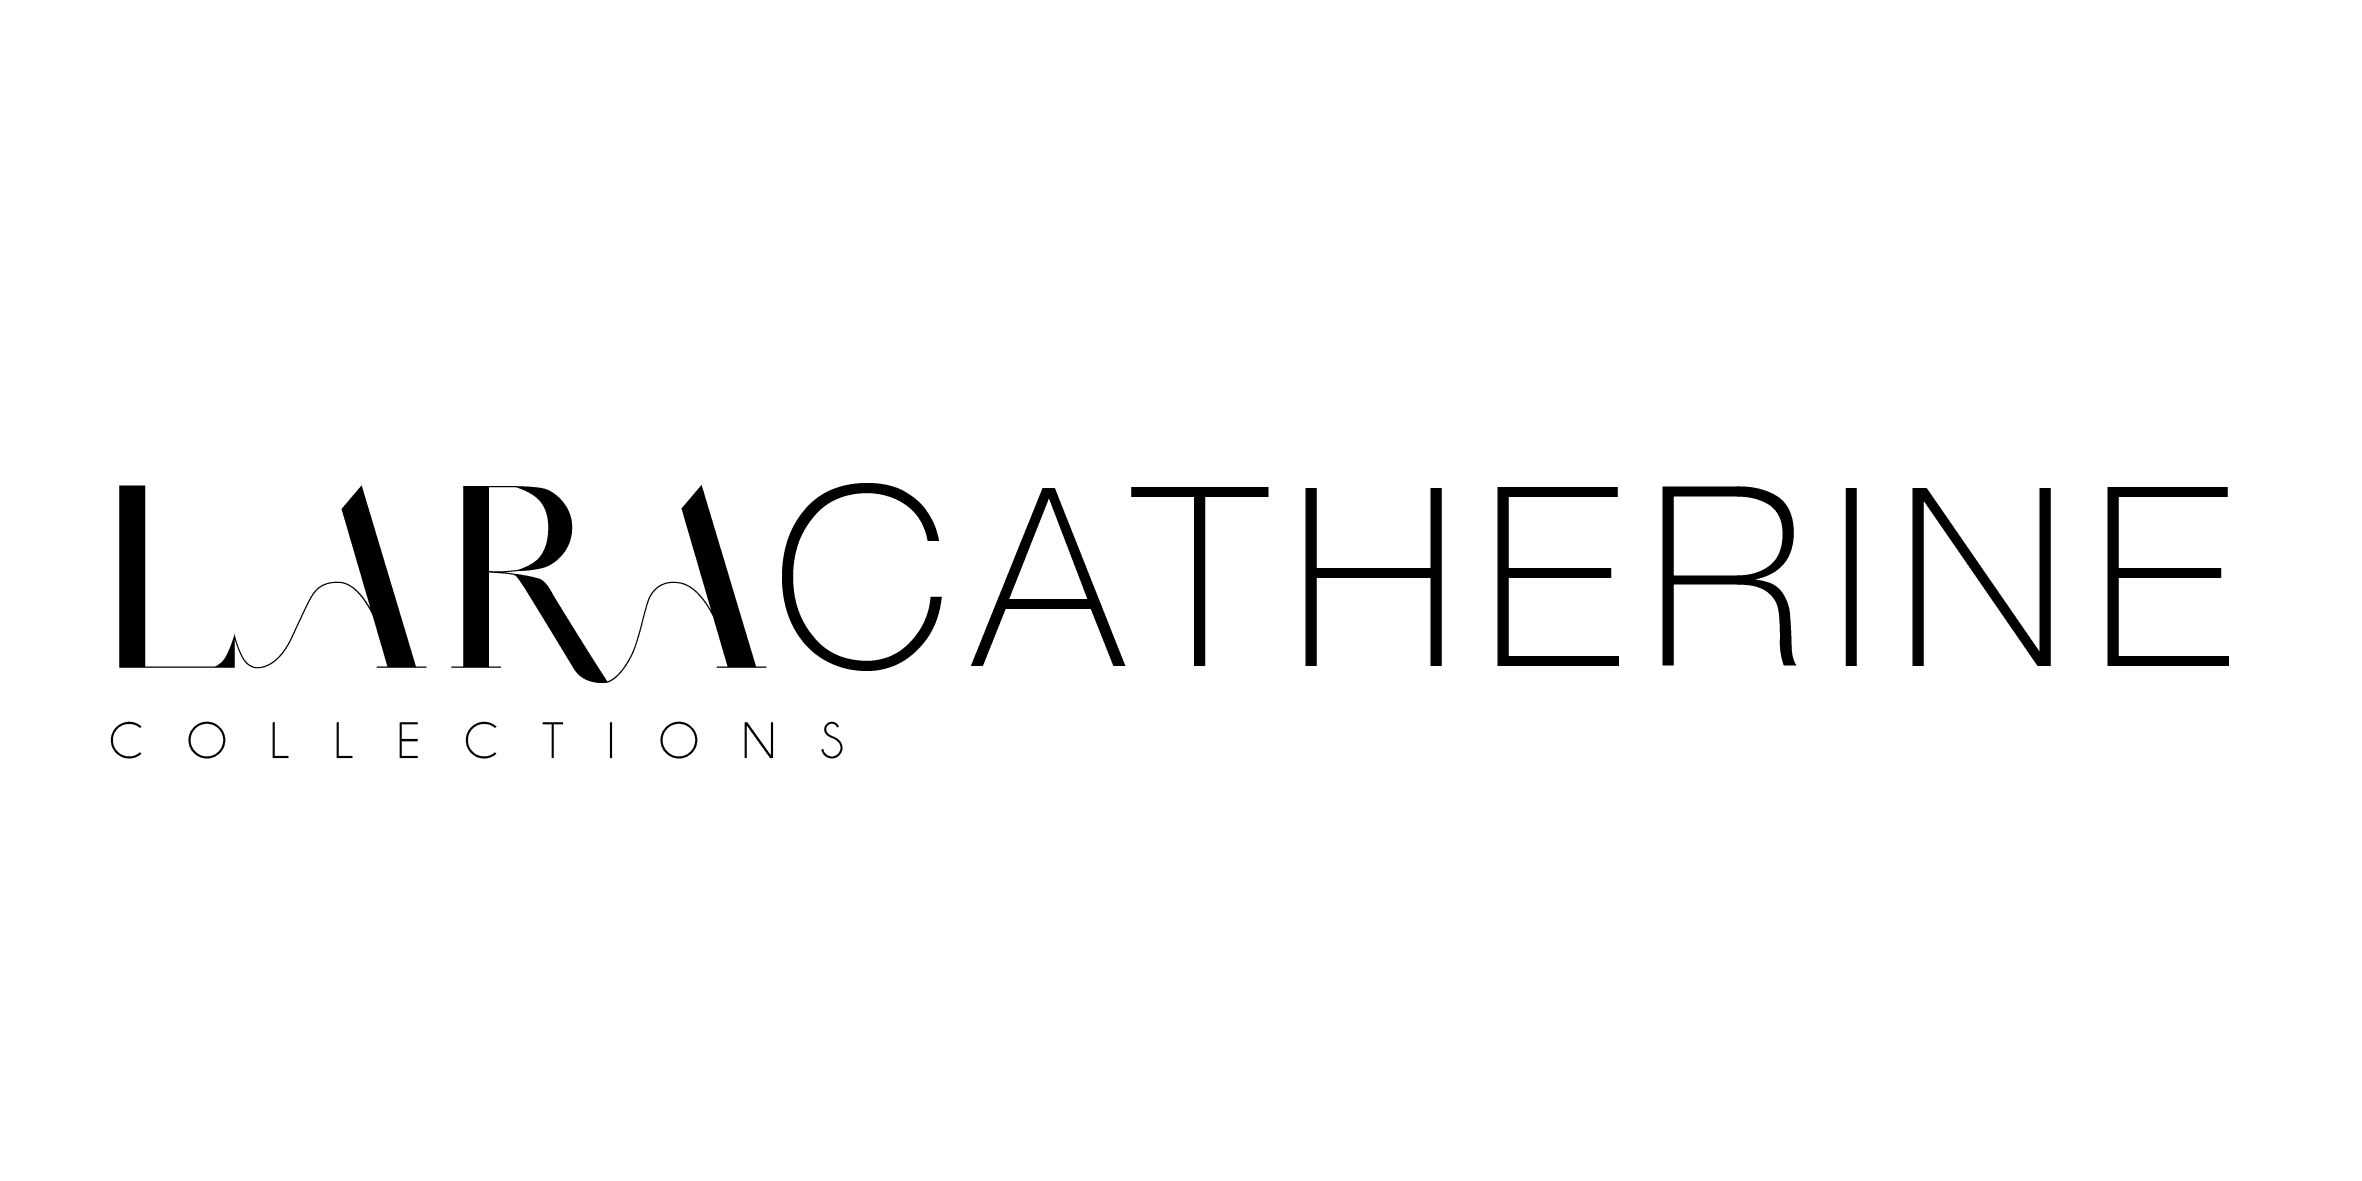 b81ffa7d84 Tienda Online de Lara Catherine Collections